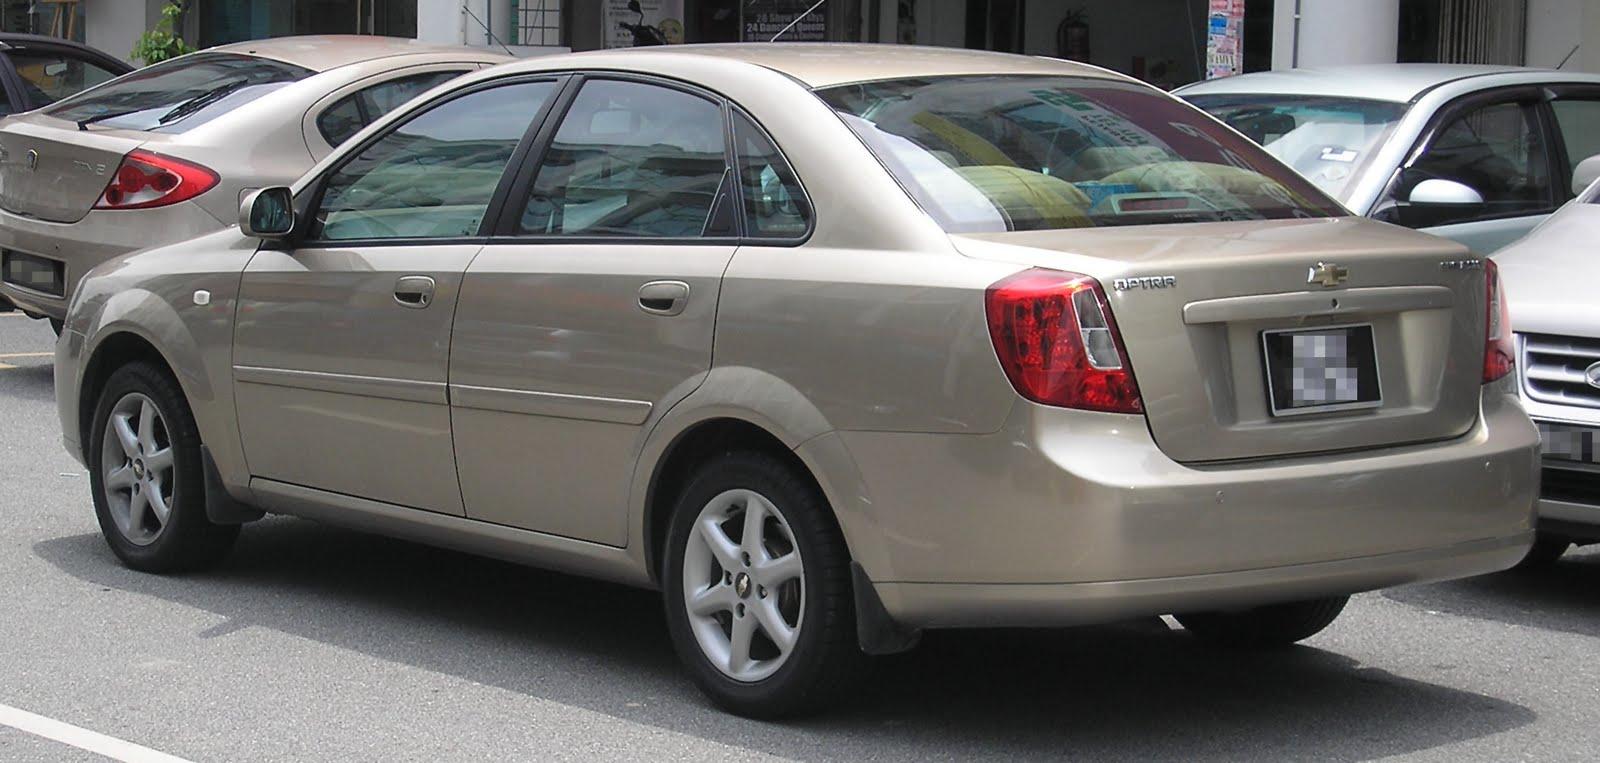 Crazy Vehicles Chevrolet Optra